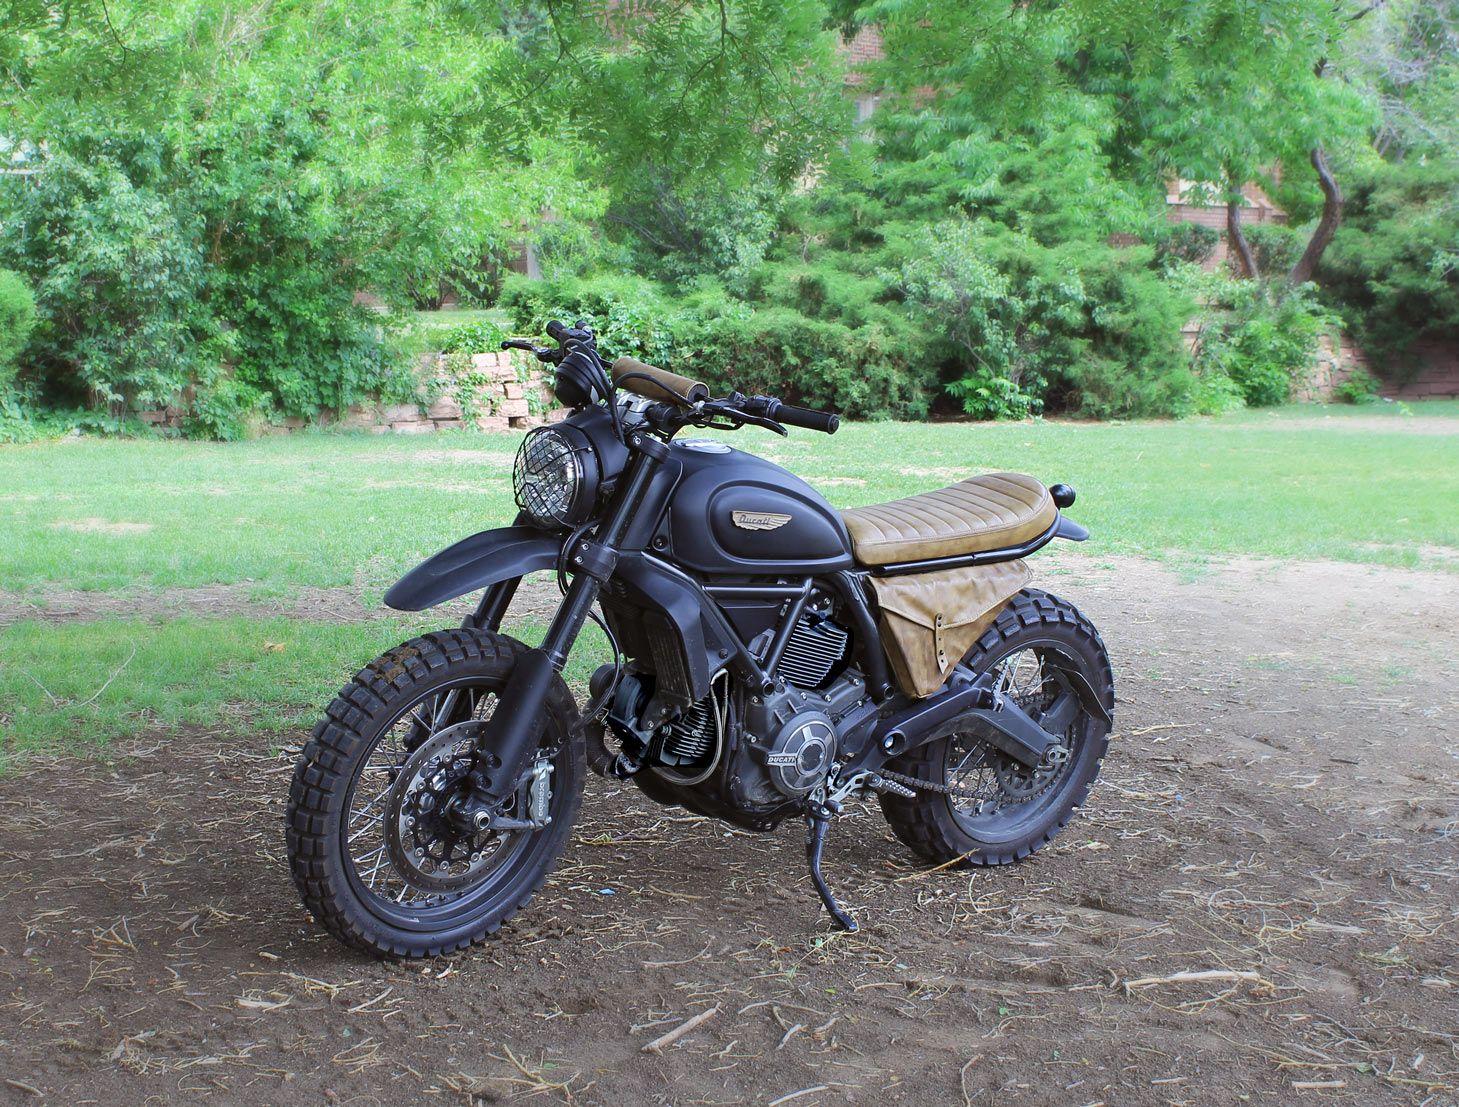 custom ducati scrambler urban enduro motos pinterest. Black Bedroom Furniture Sets. Home Design Ideas